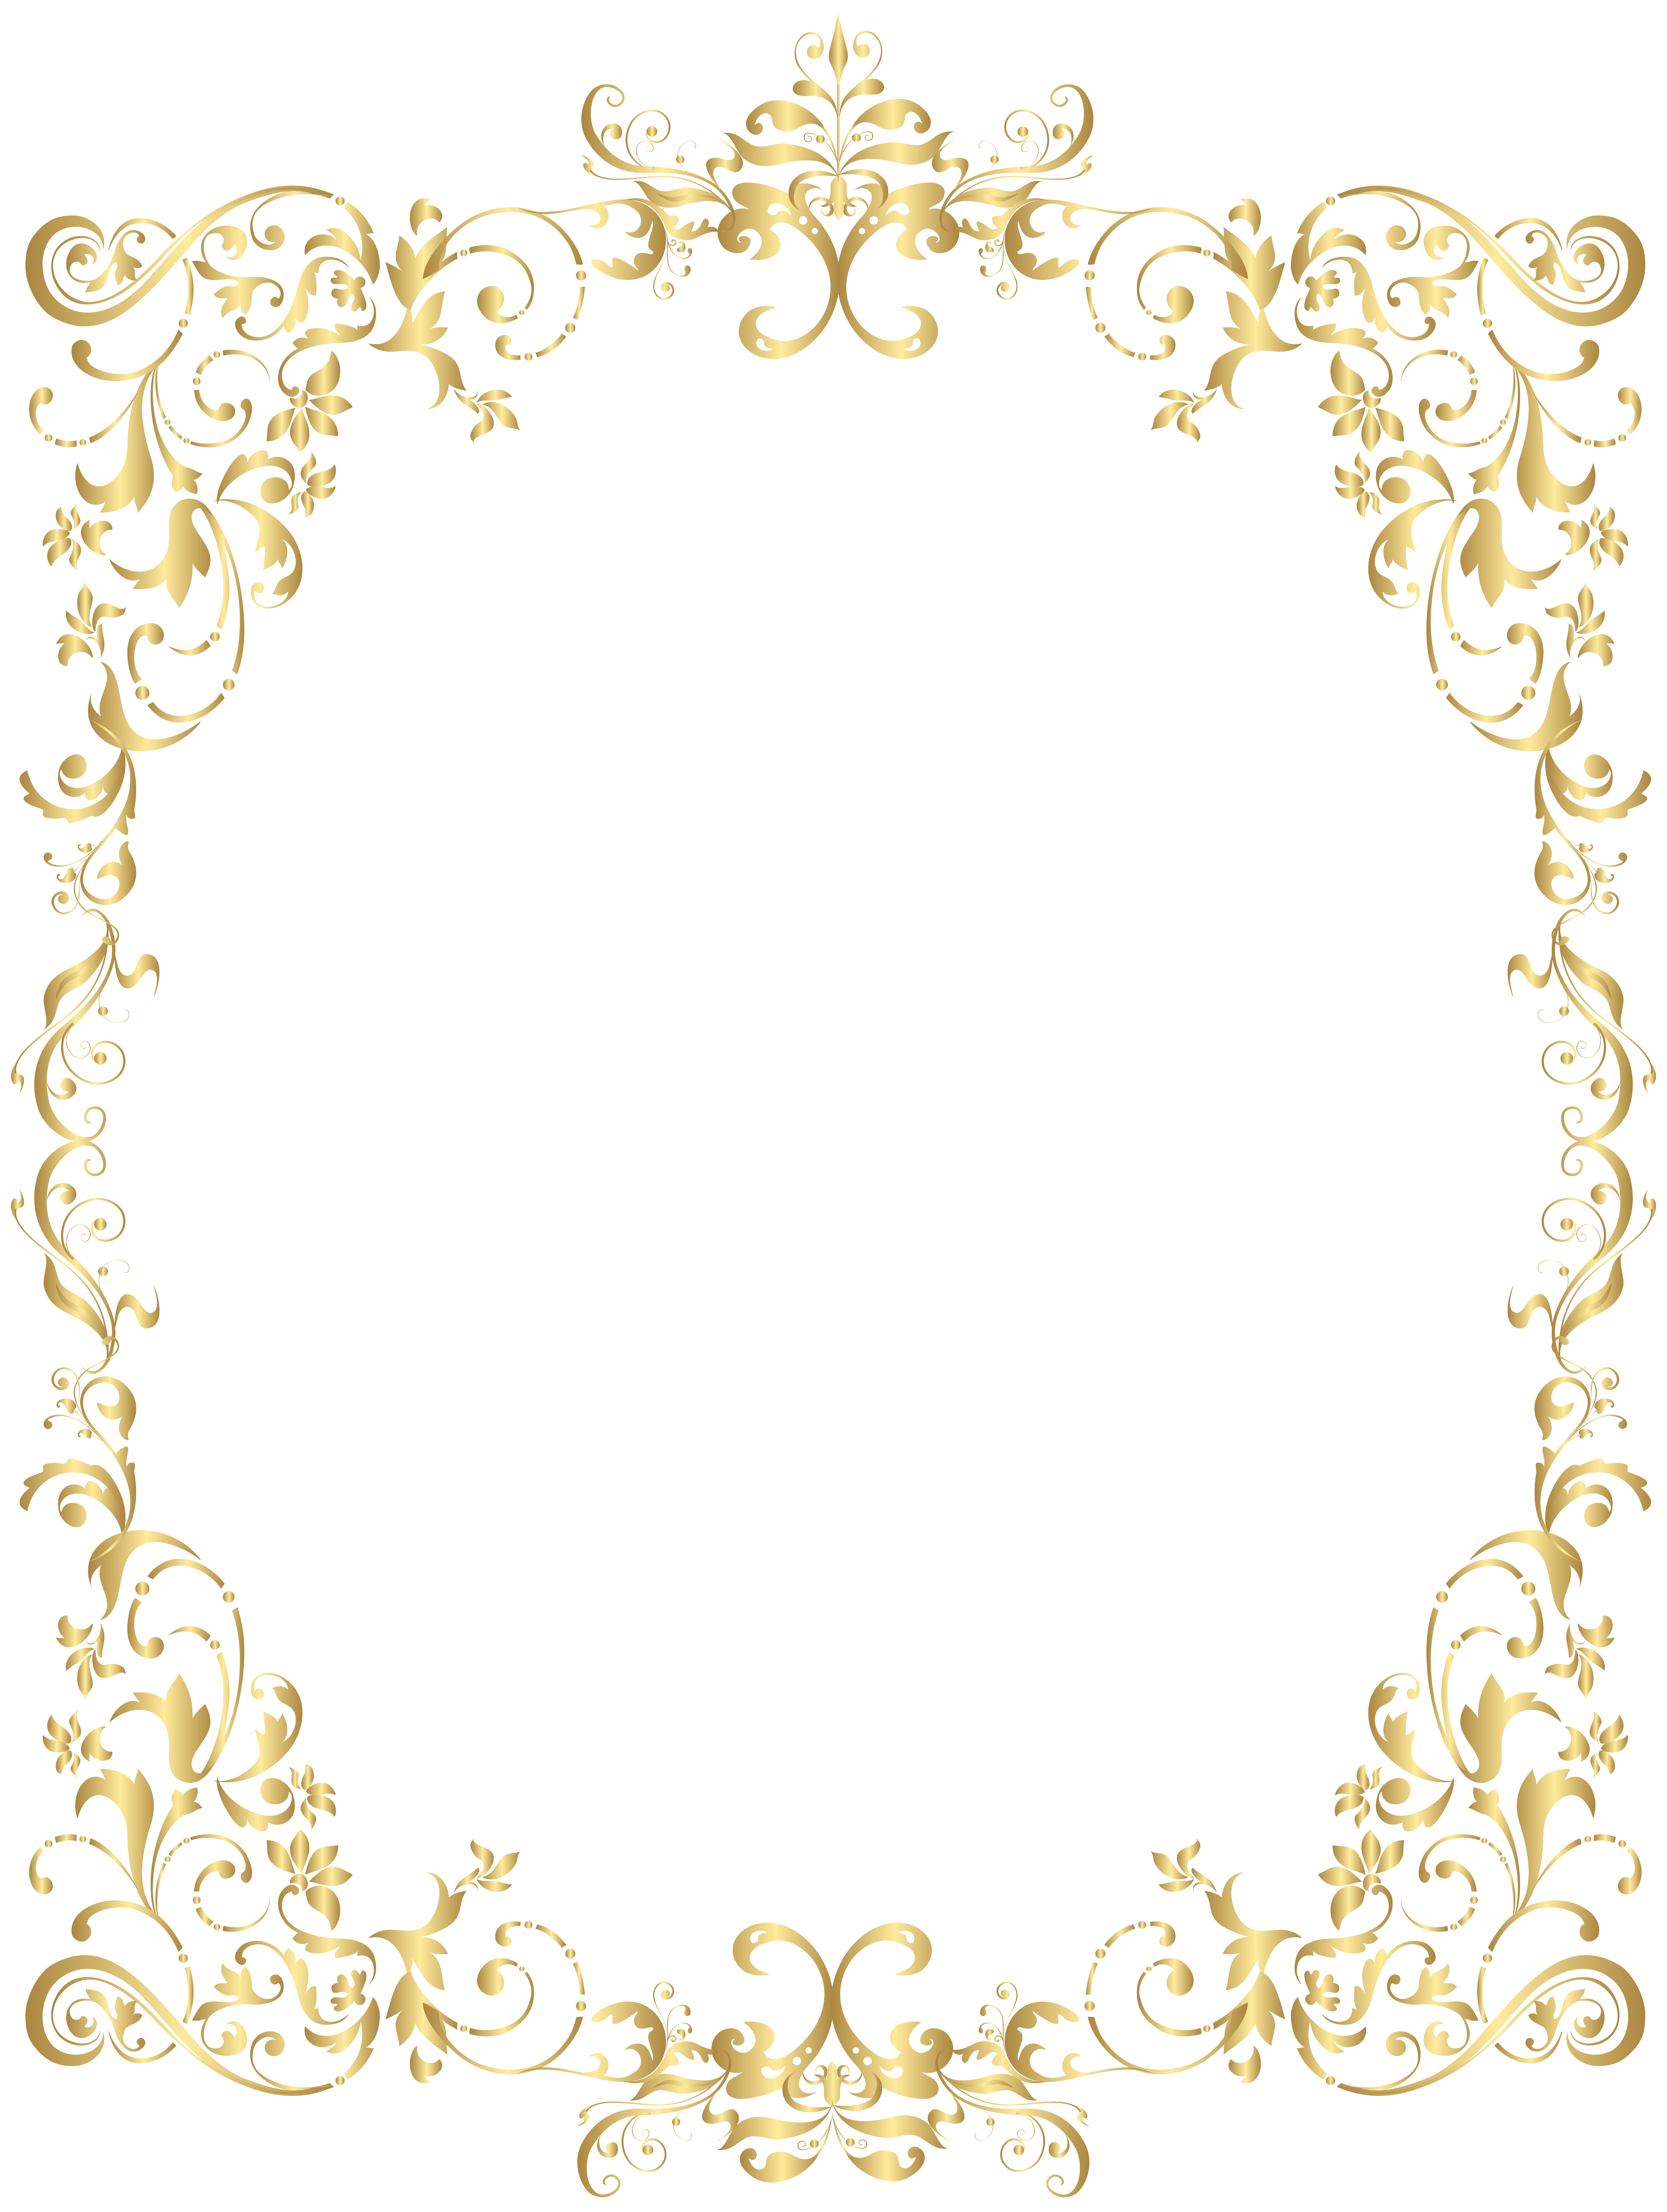 Clipart castle gold glitter. Border decorative frame png